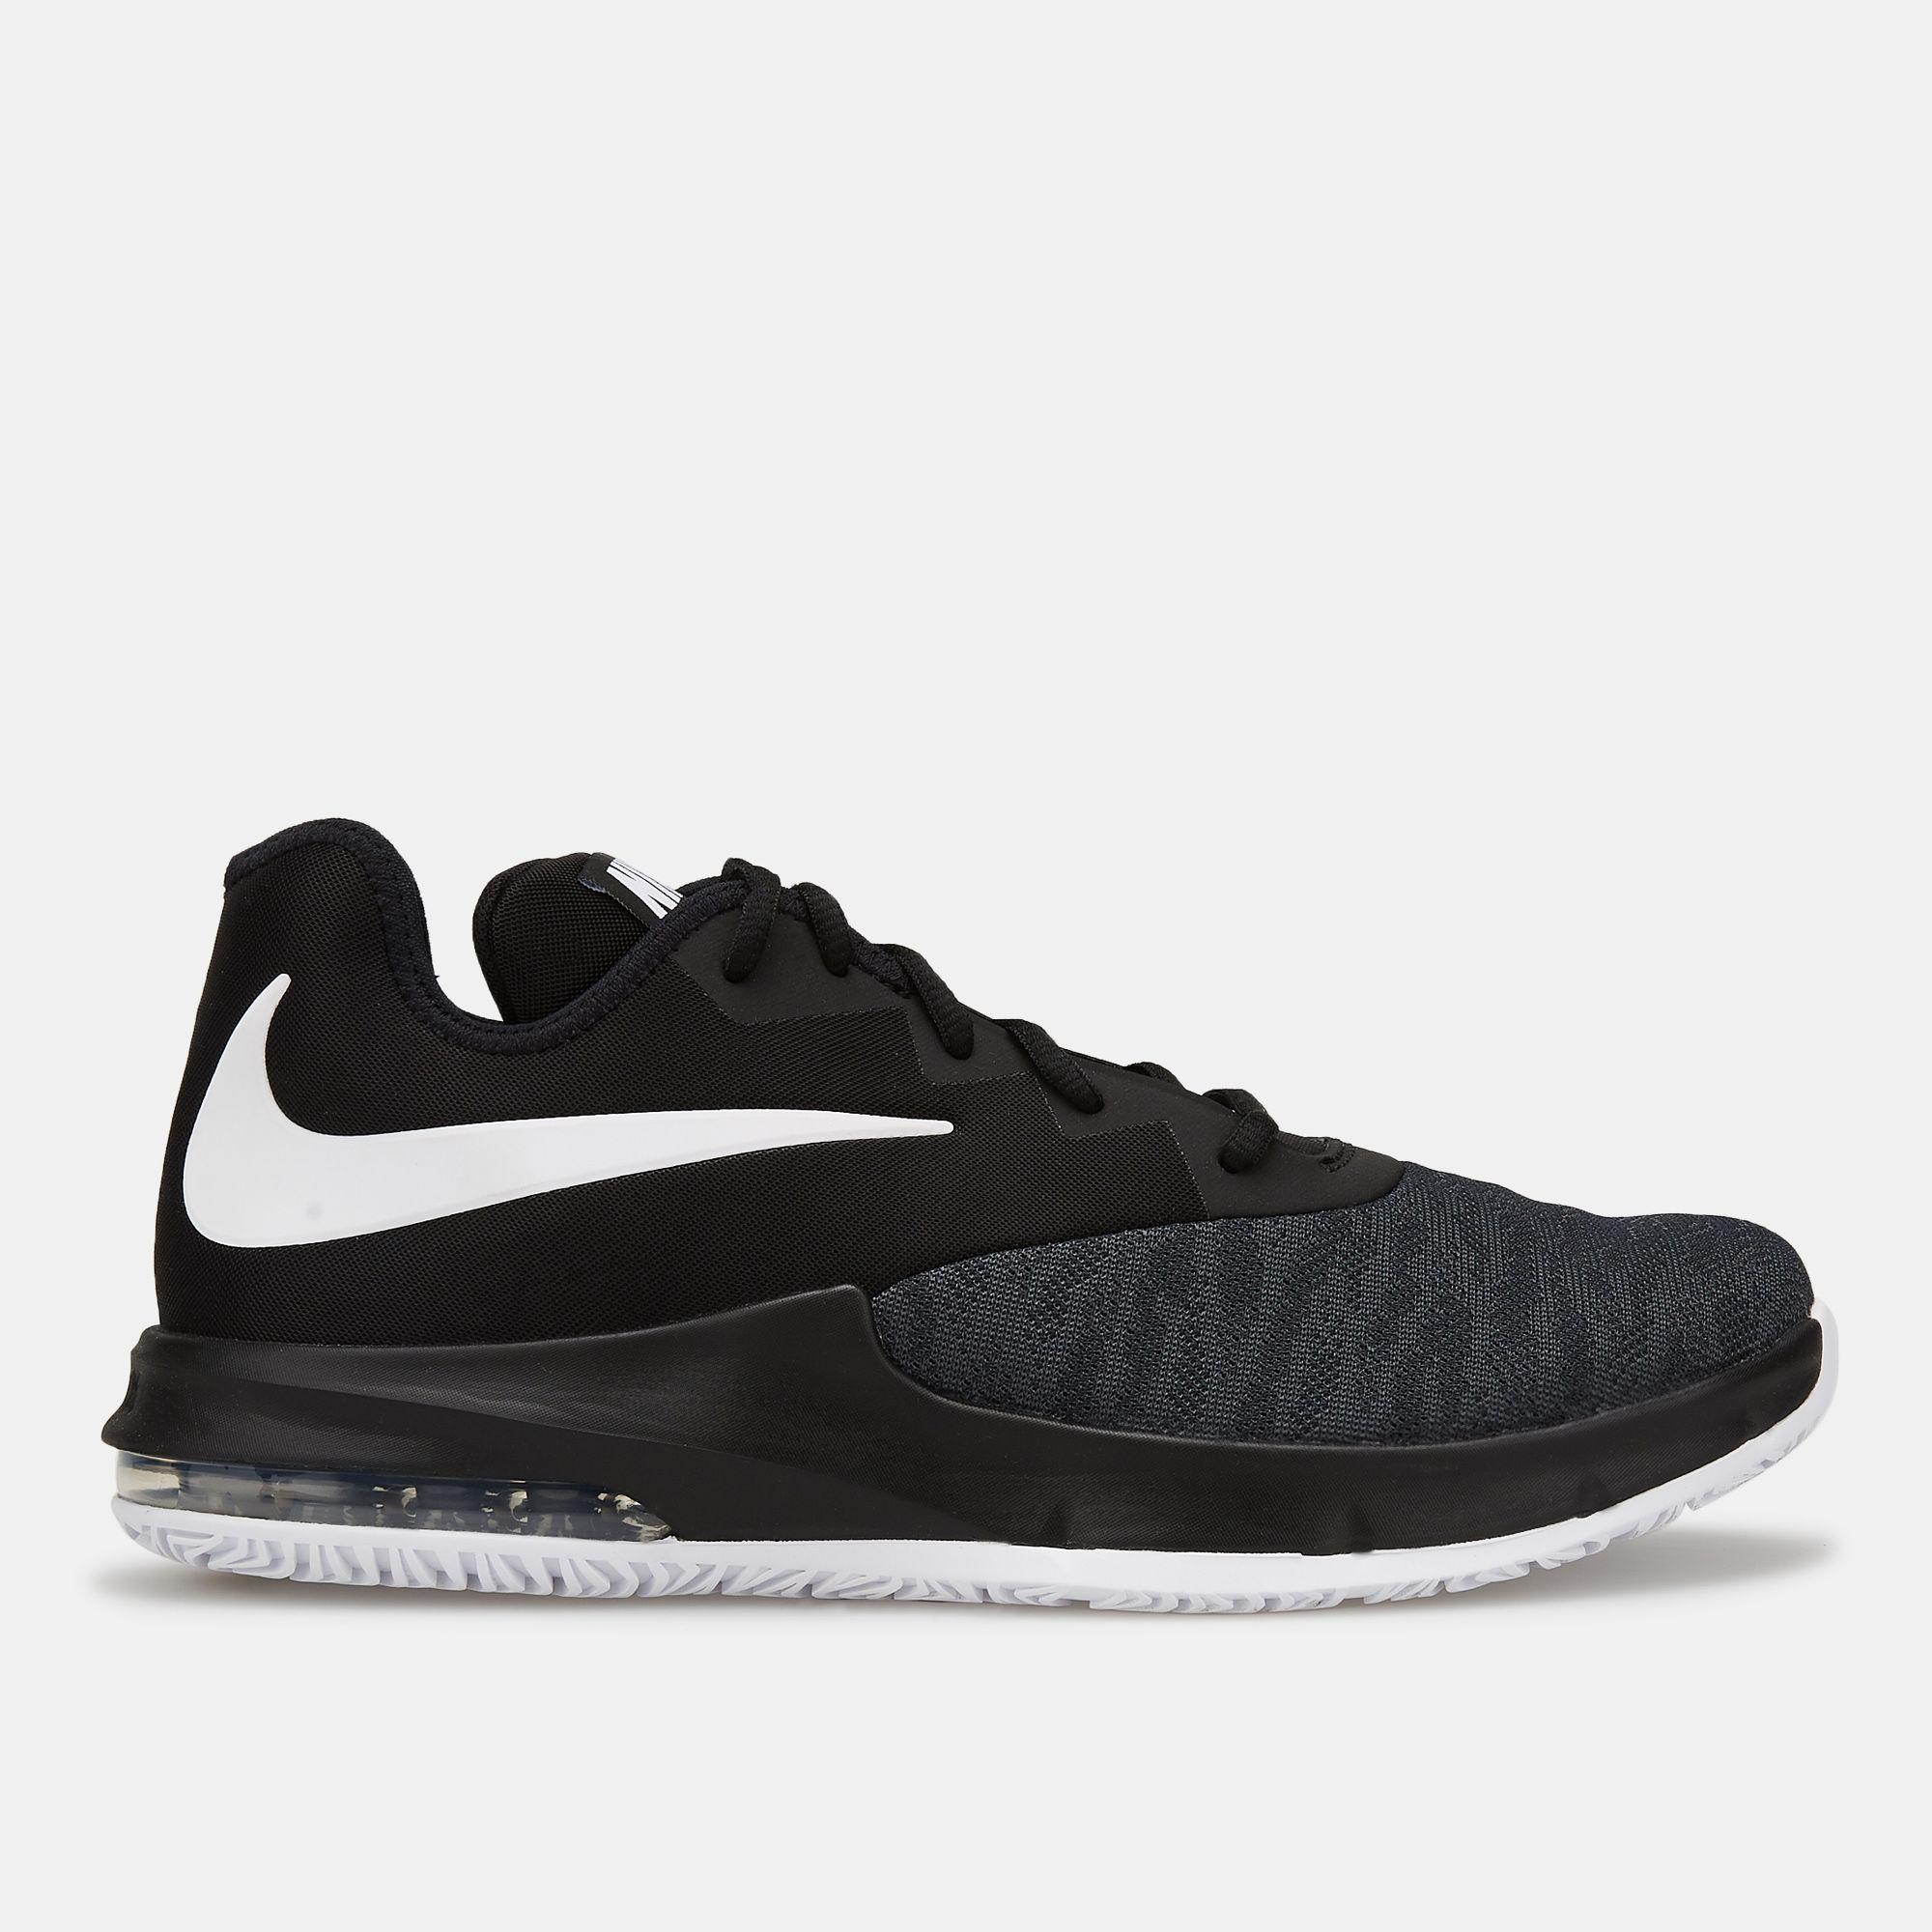 ba90ad3fa8 Nike Men's Air Max Infuriate III Low Basketball Shoe